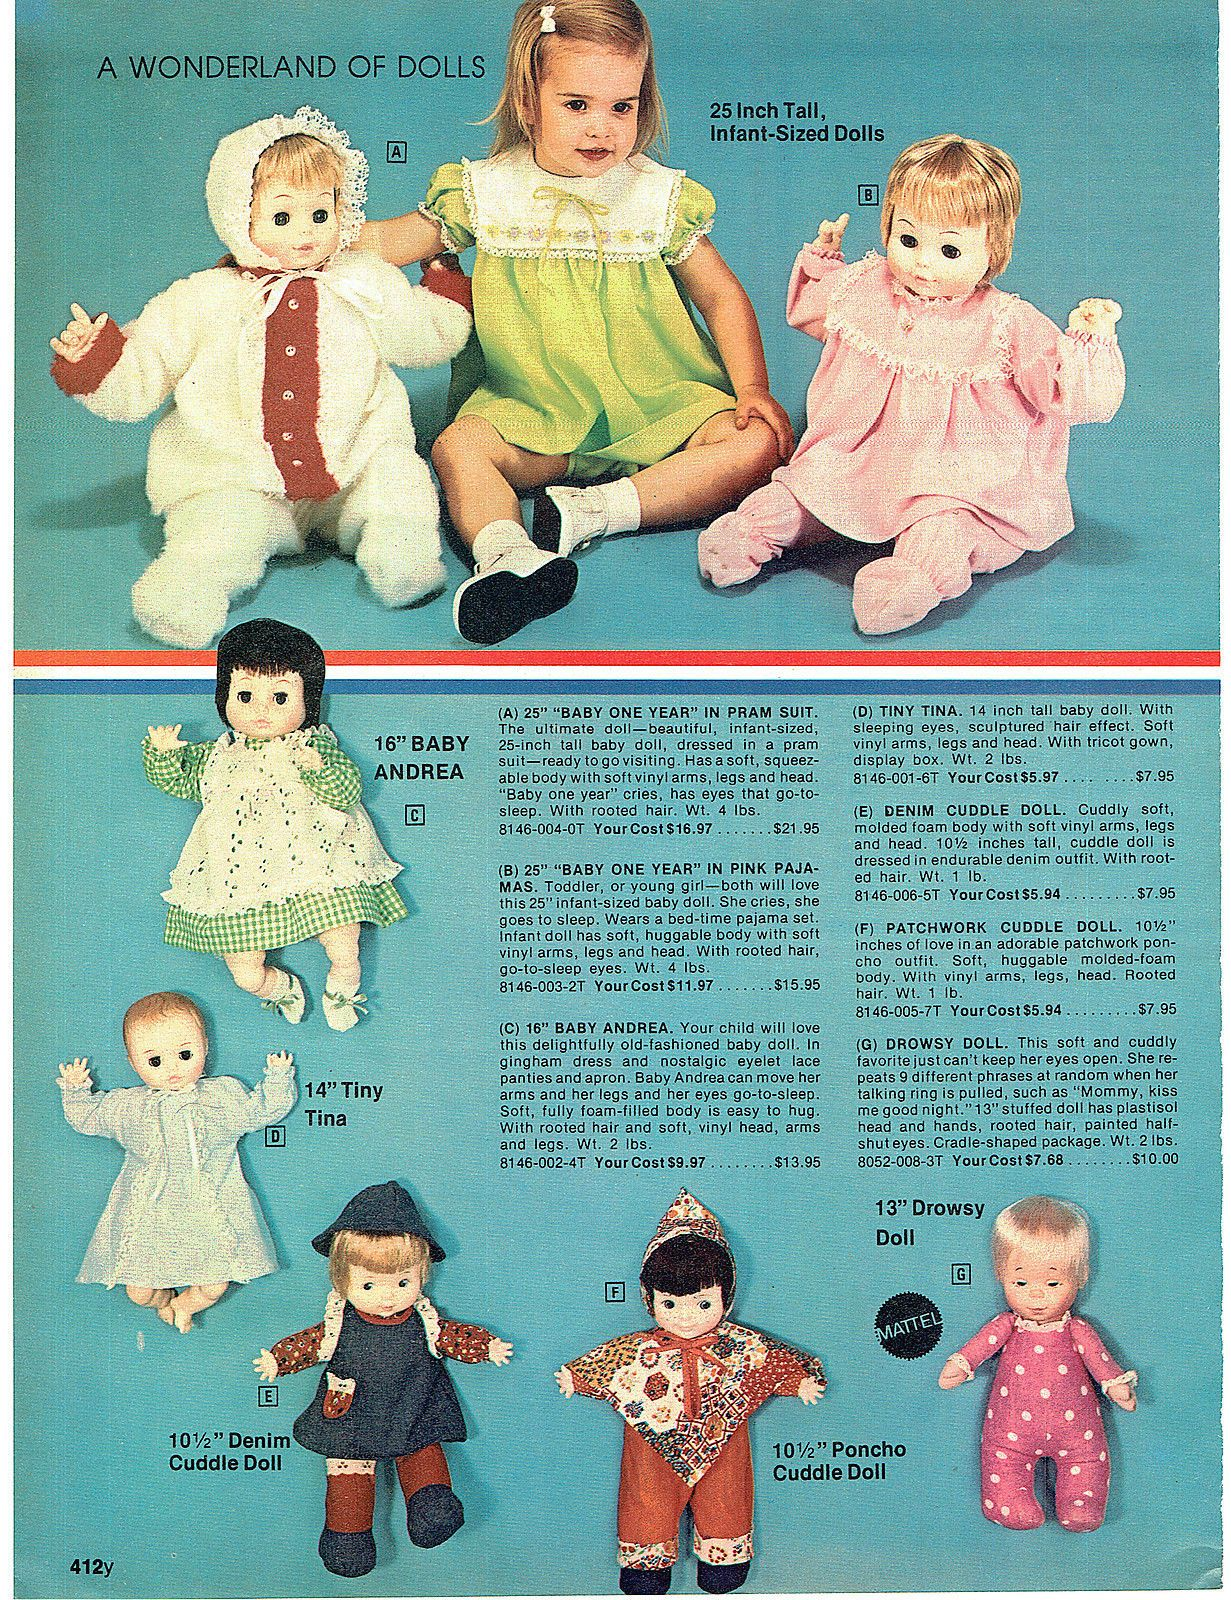 1976 Advert Barbie Doll Townhouse 10 Speed Bicycle Nina Ballerina Baby Alive   eBay